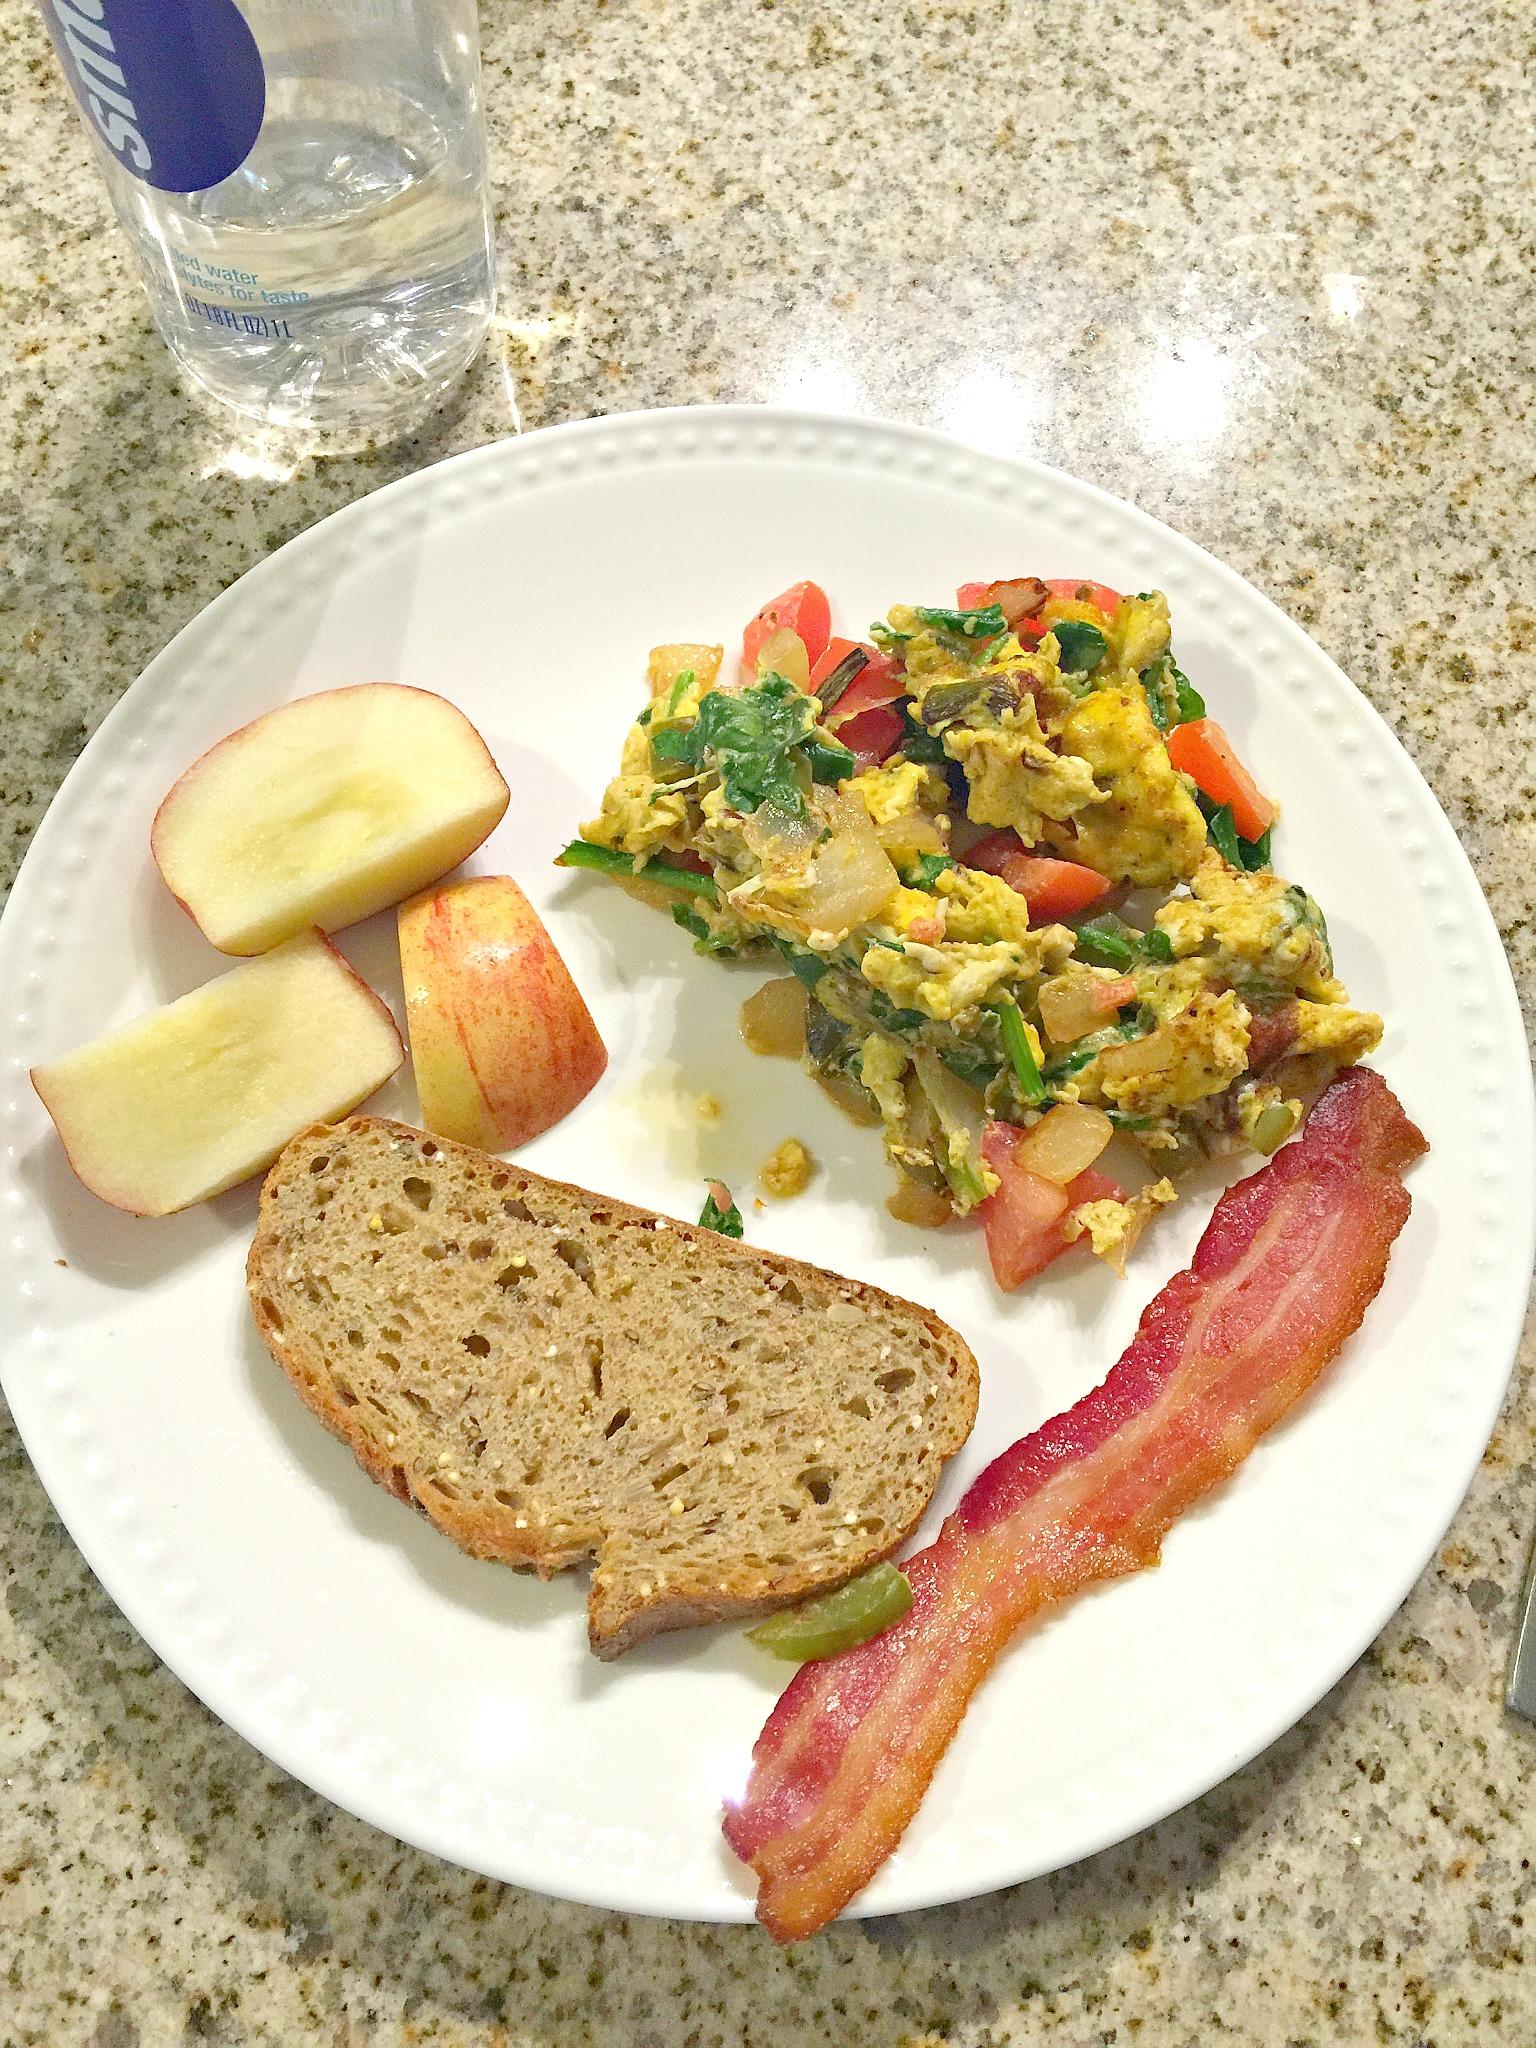 Perfect Breakfast: Whole Grain Toast, Apple Slices, Bacon & Veggie Egg Scramble.